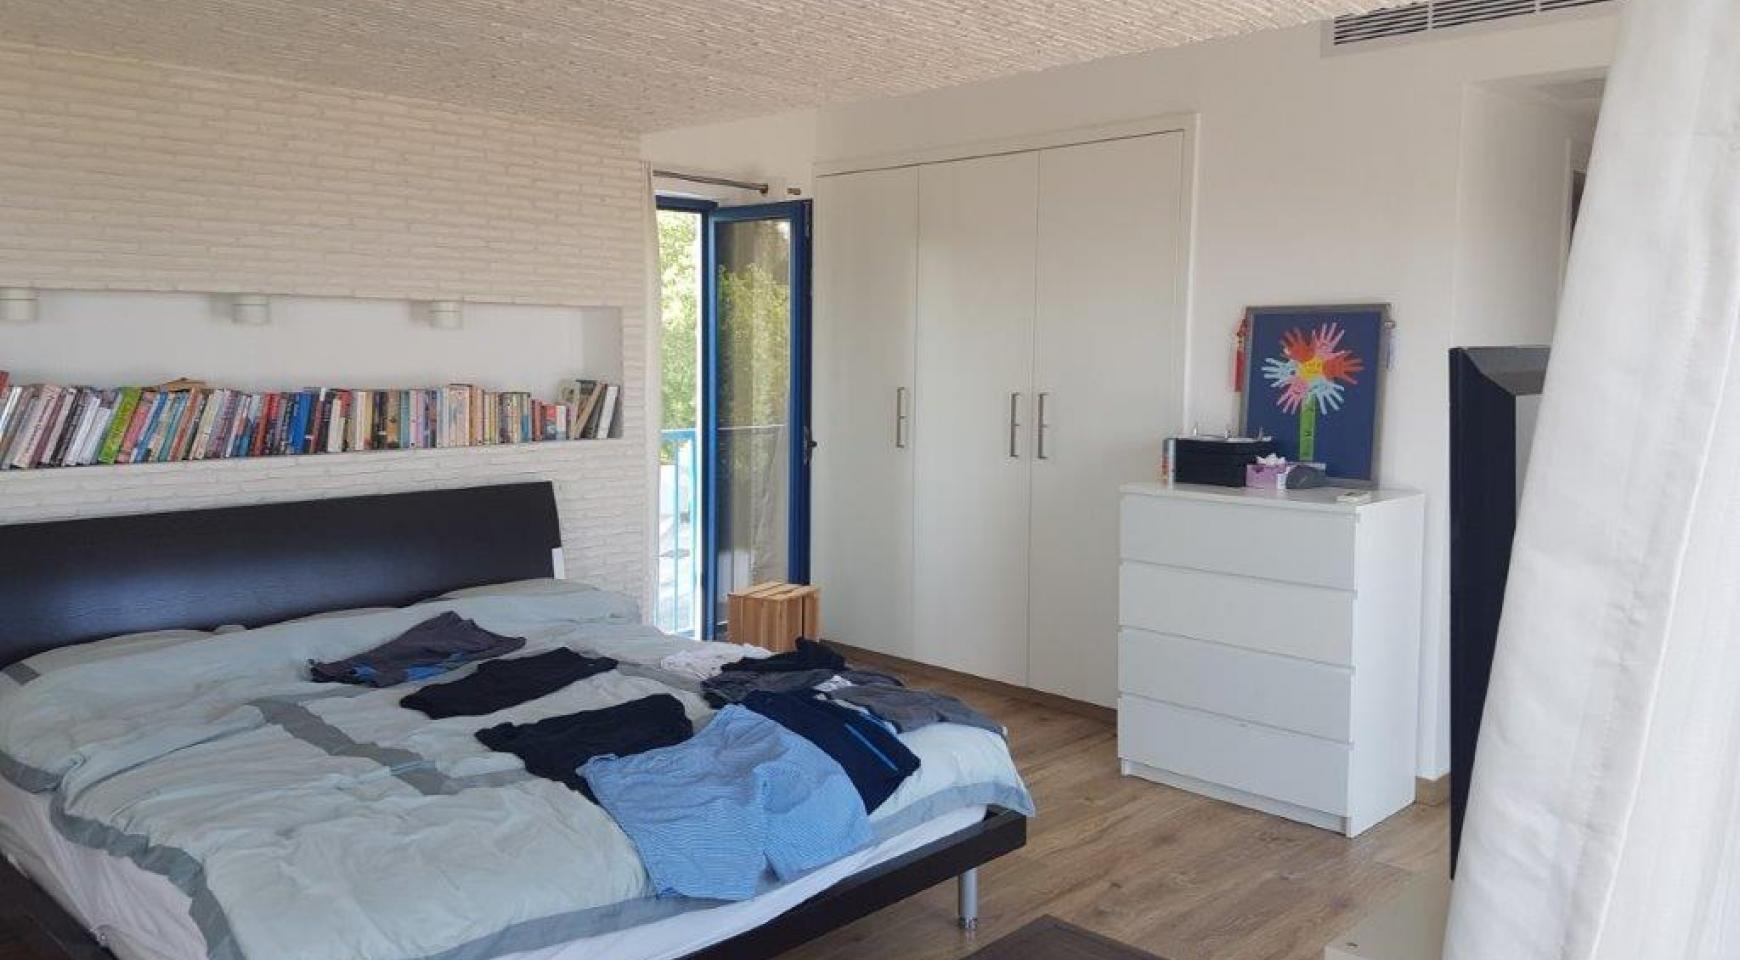 5-Спальная Вилла с видом на Море в районе  Agios Tychonas - 19